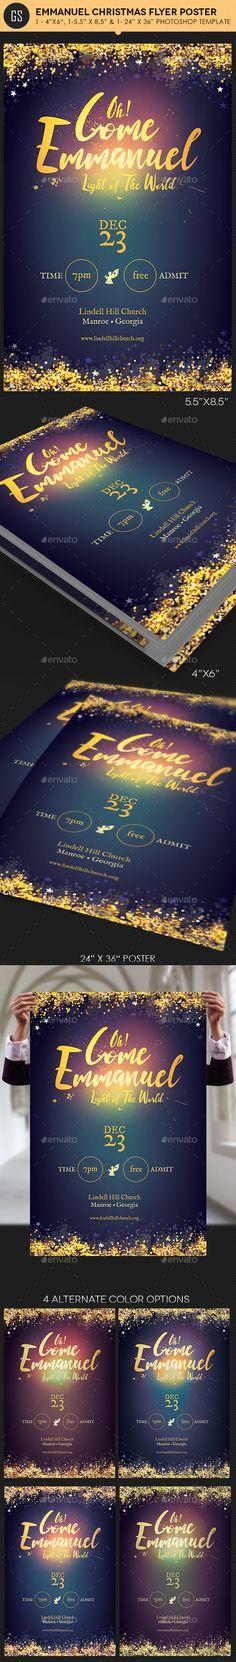 Emmanuel Christmas Cantata Flyer / Poster Template PSD